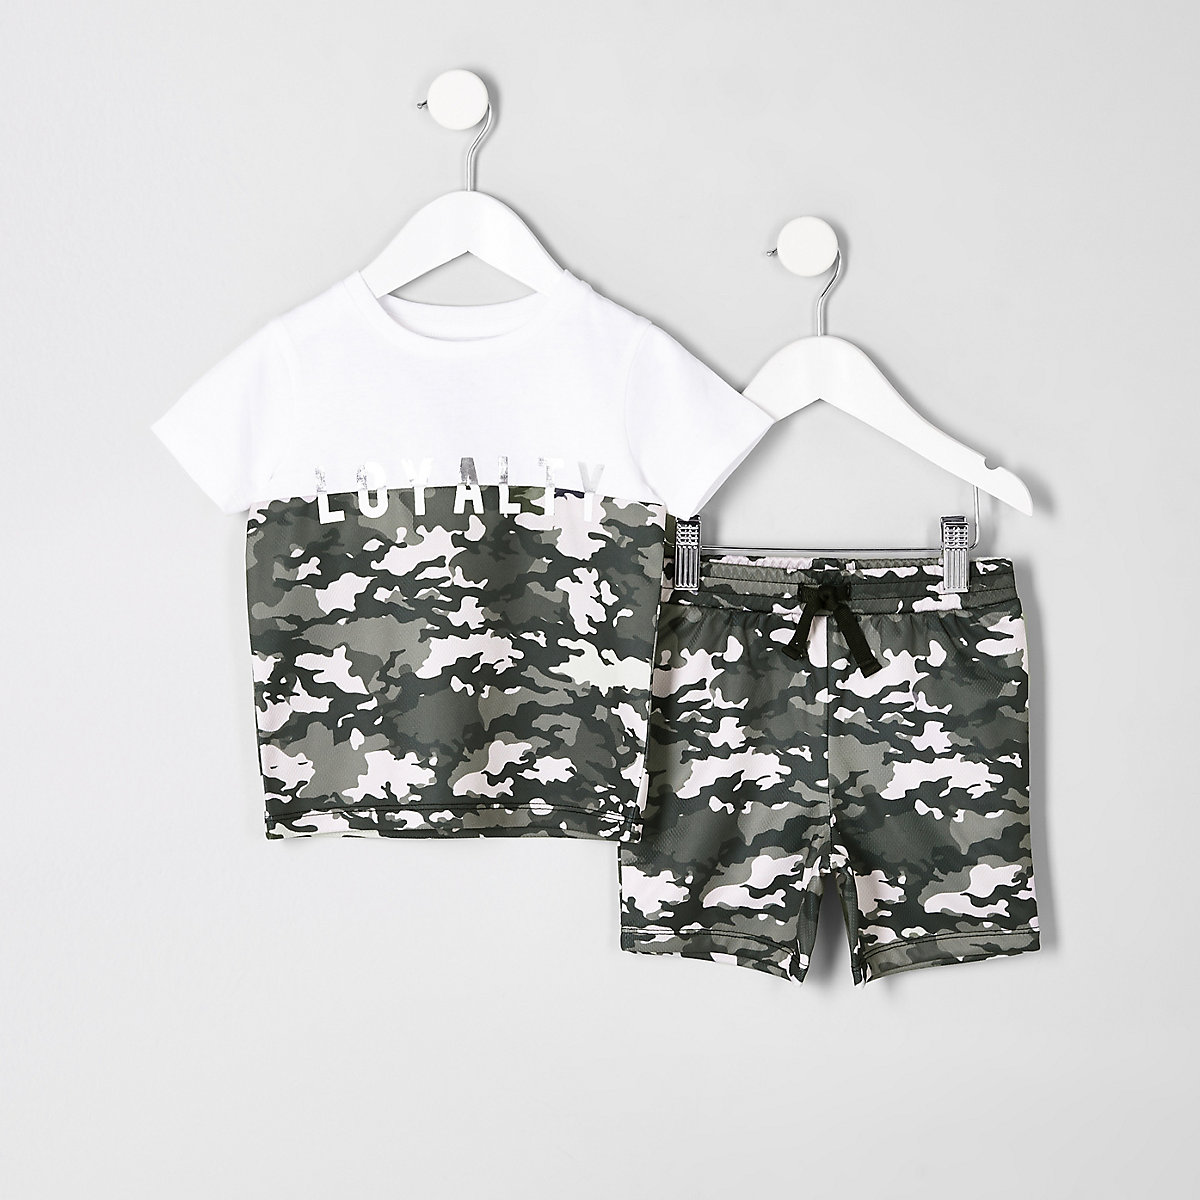 Mini boys white camo 'loyalty' T-shirt outfit